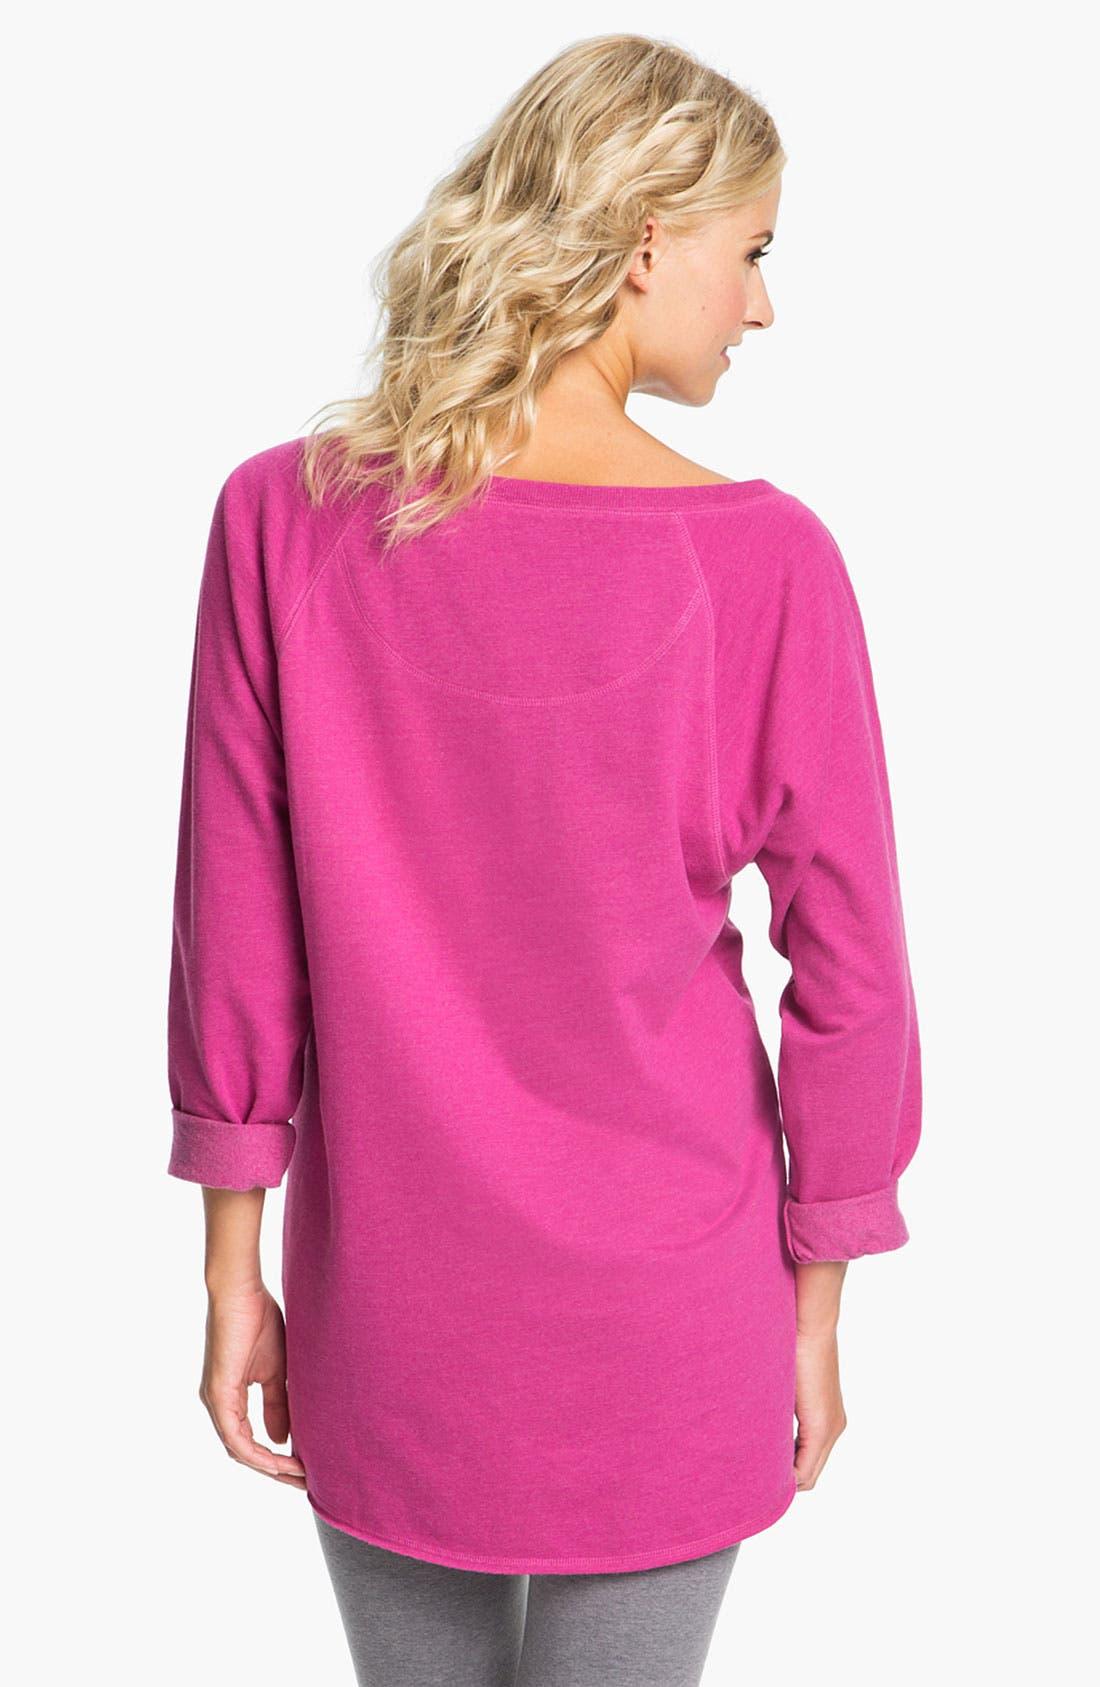 Alternate Image 2  - Make + Model 'Bundled' Sweatshirt